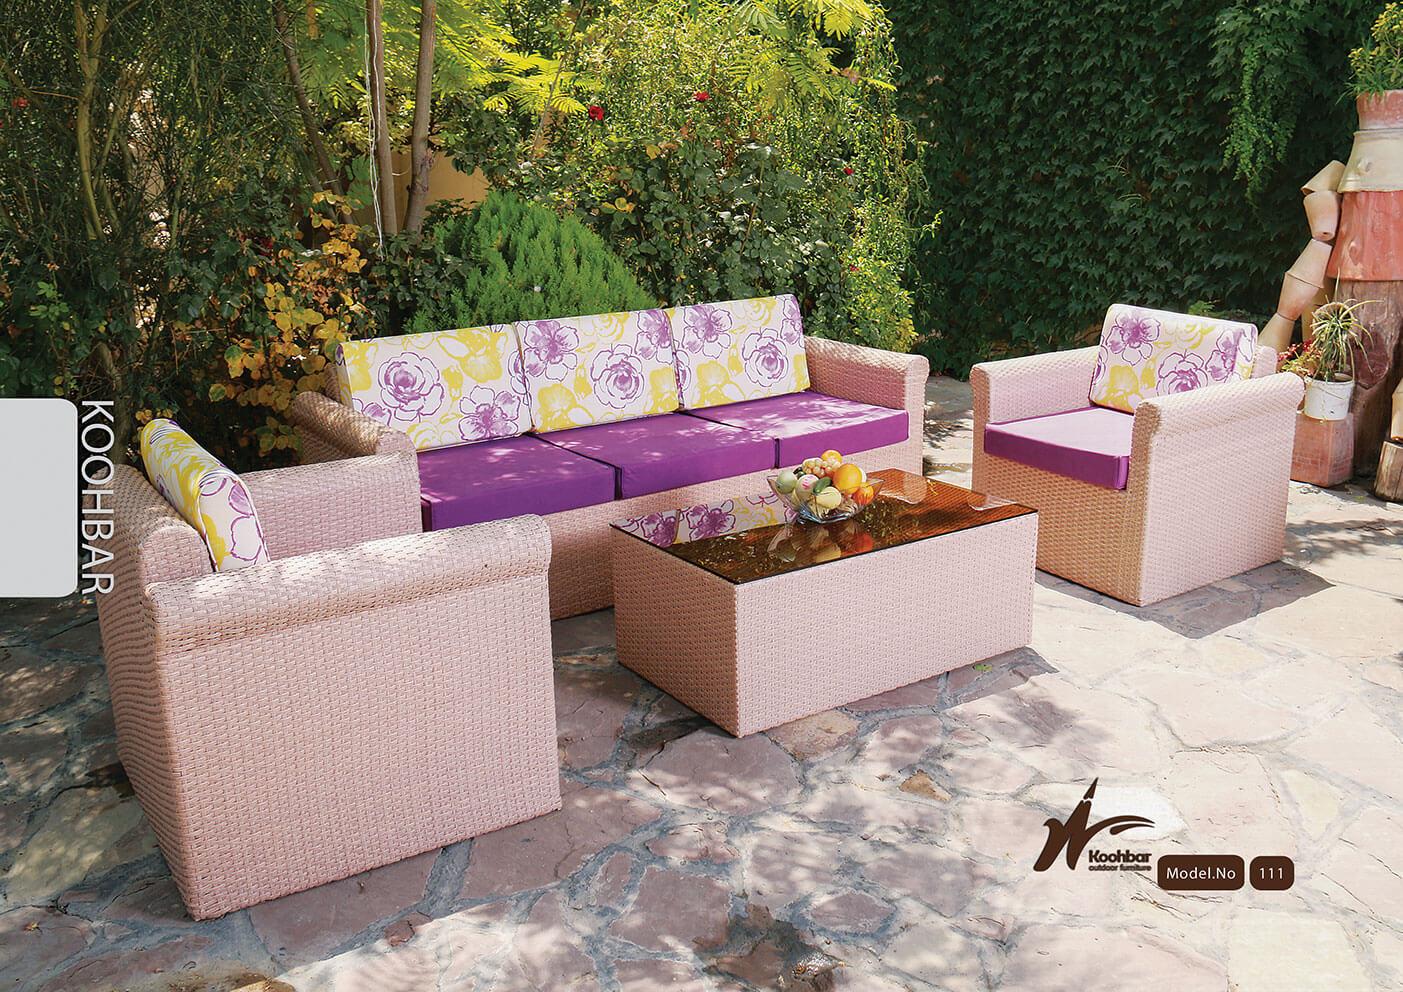 kohbar patio conversation sets 111 model0 - ست مبلمان حصیری محوطه کوهبر مدل ۱۱۱ - - patio-conversation-sets